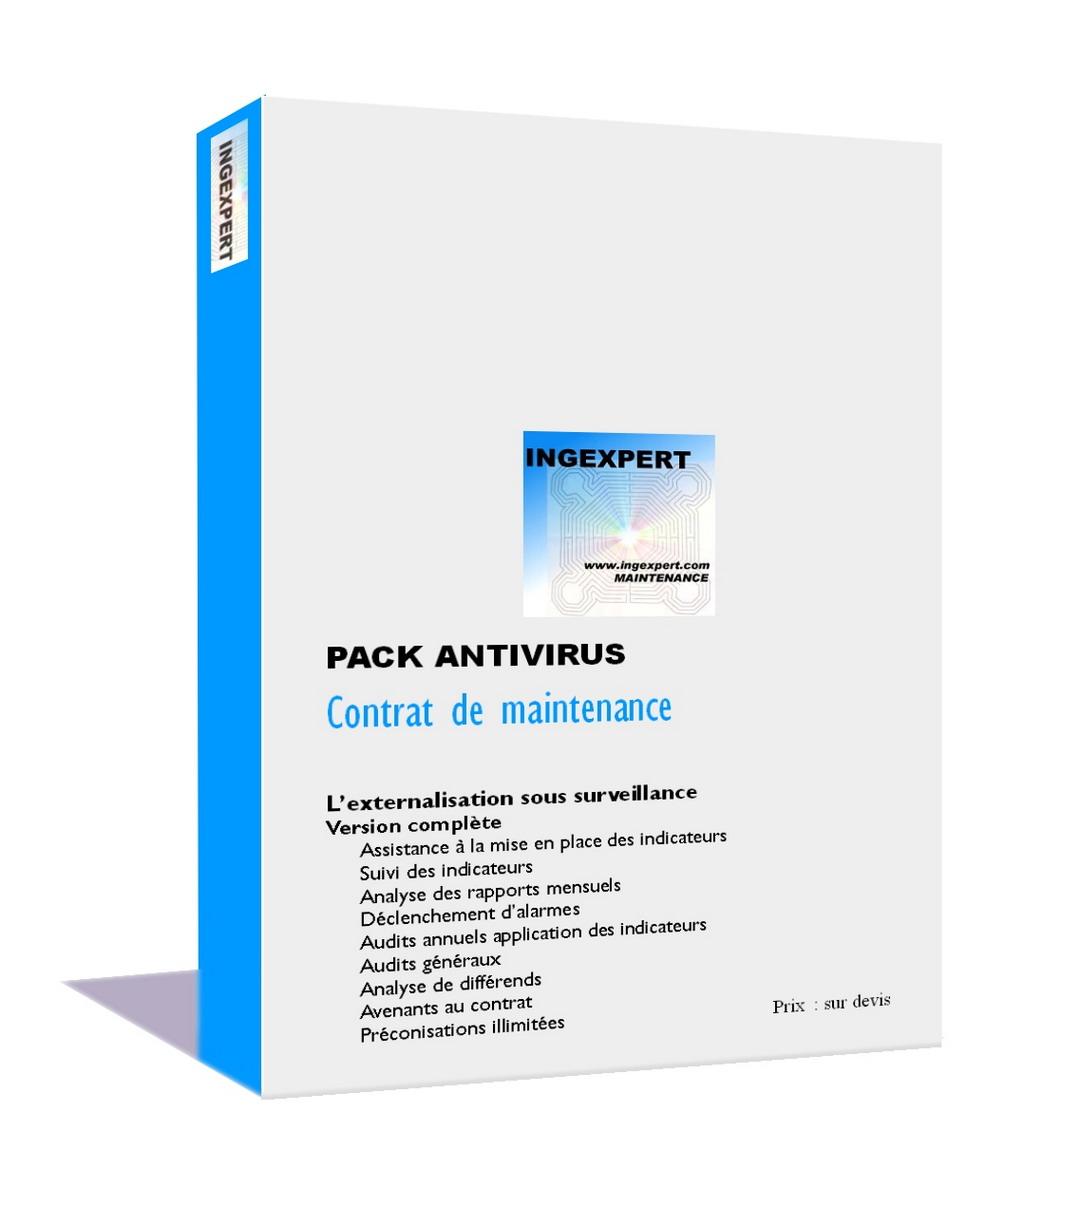 https://www.ingexpert.com/images/Ingexpert%20Pack%20antivirus%20contrat%20complet.jpg